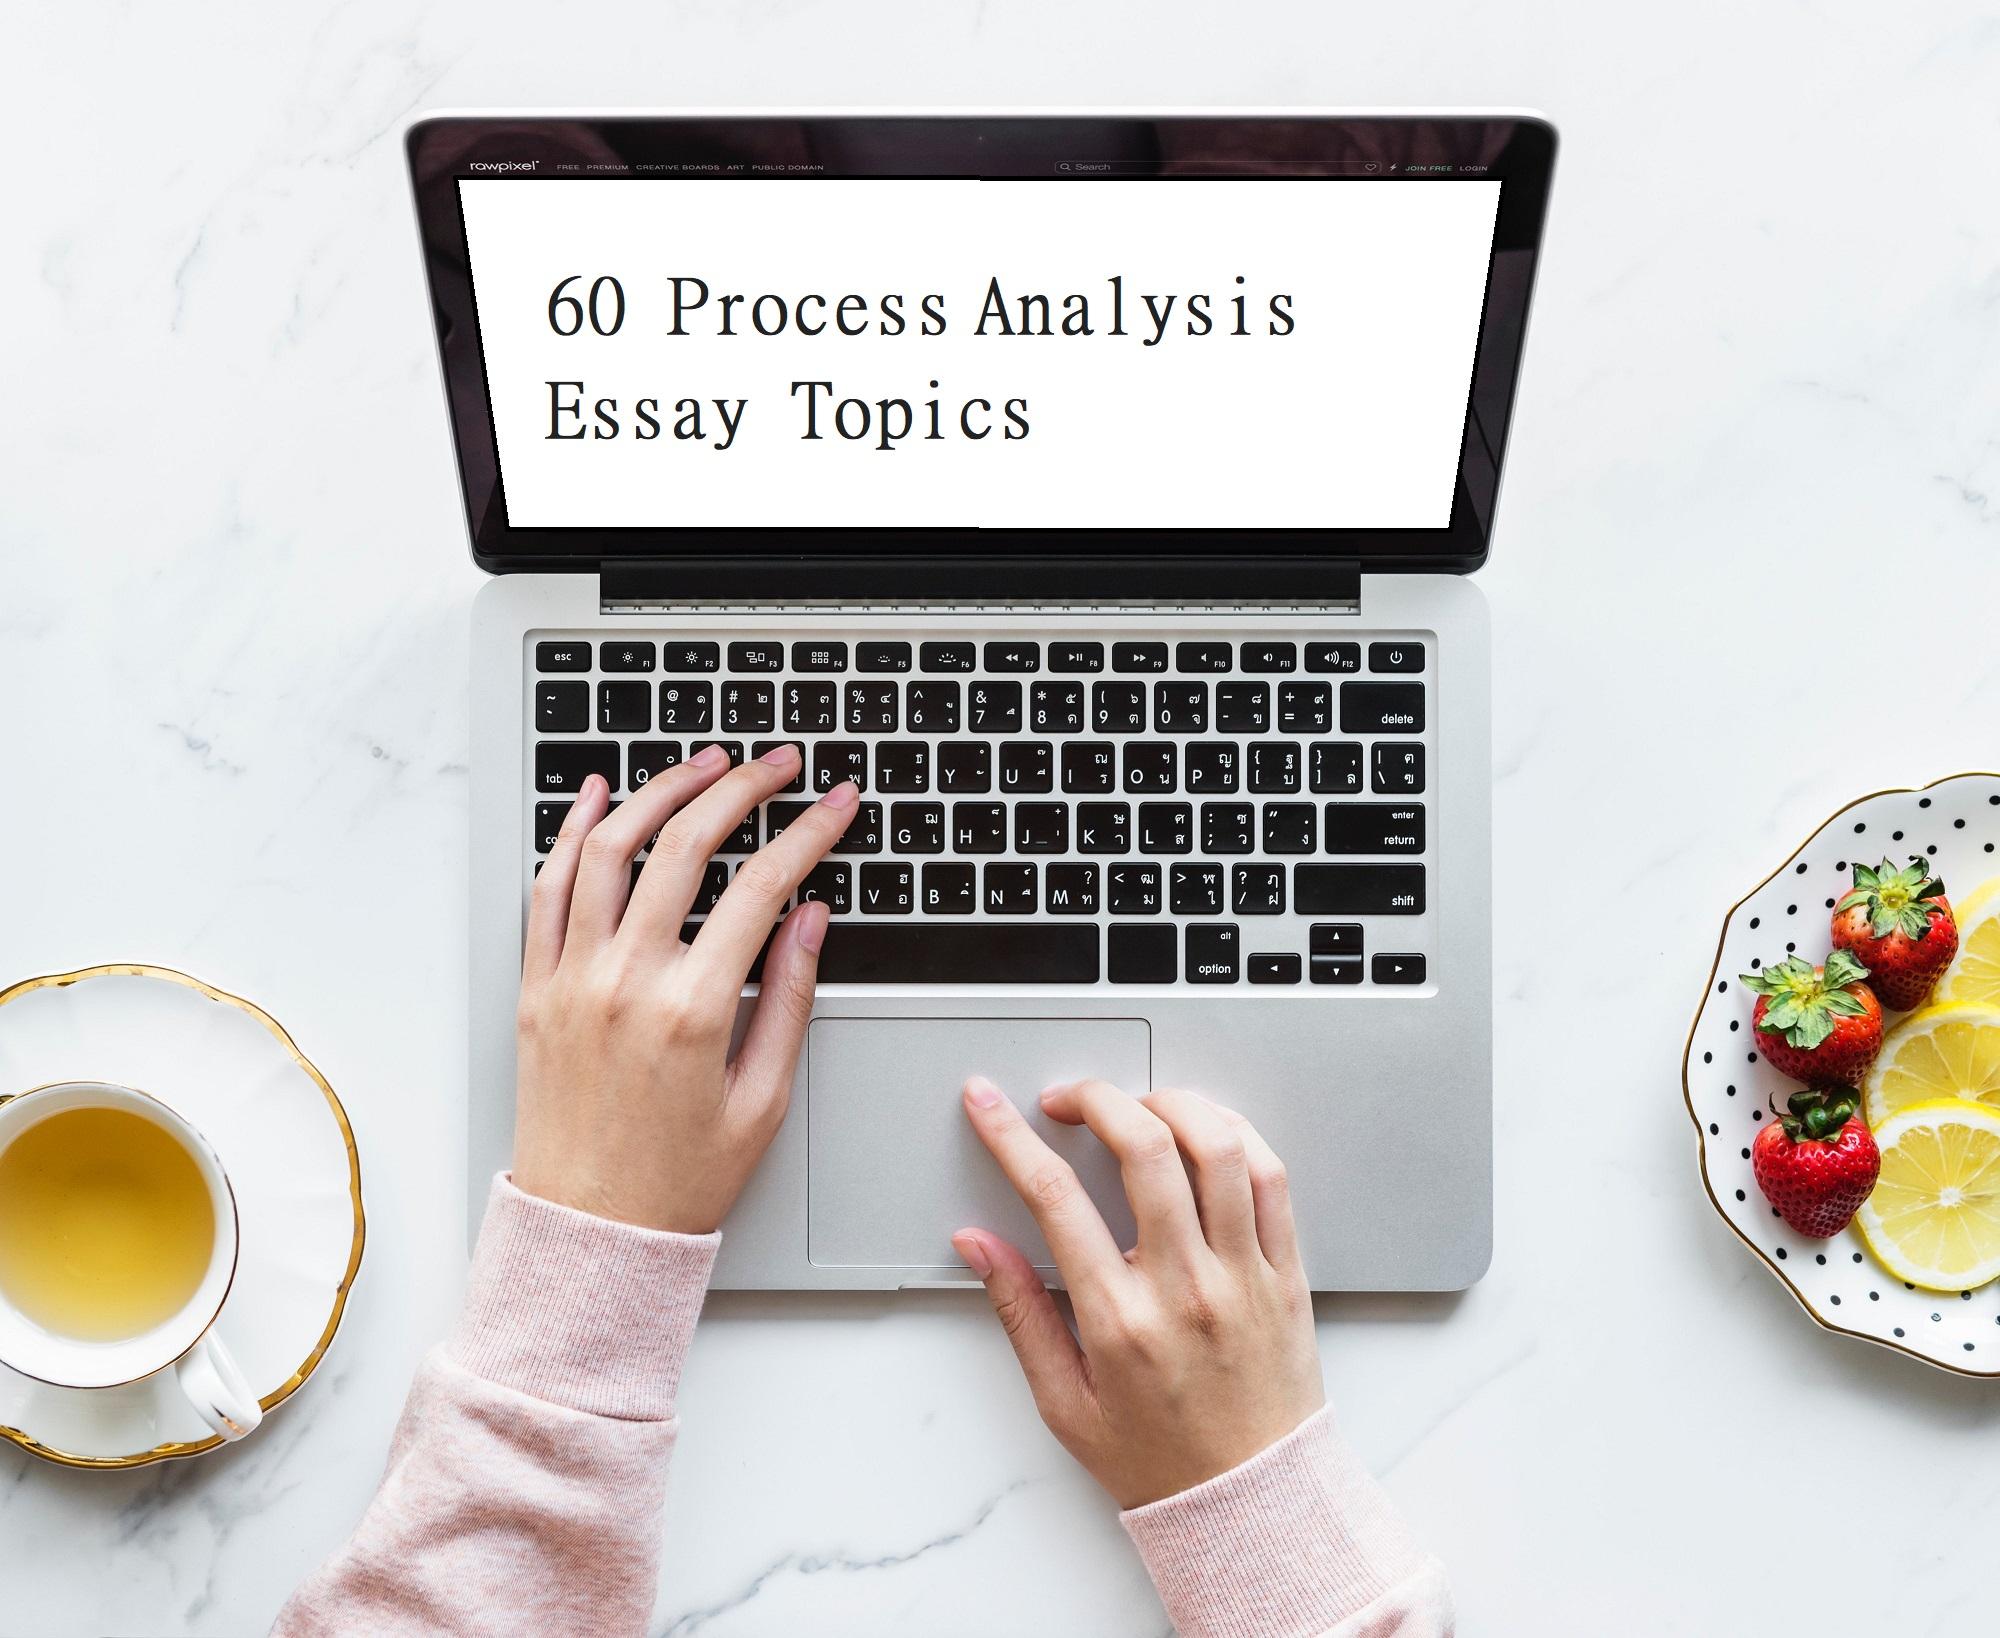 60 Process Analysis Essay Topics